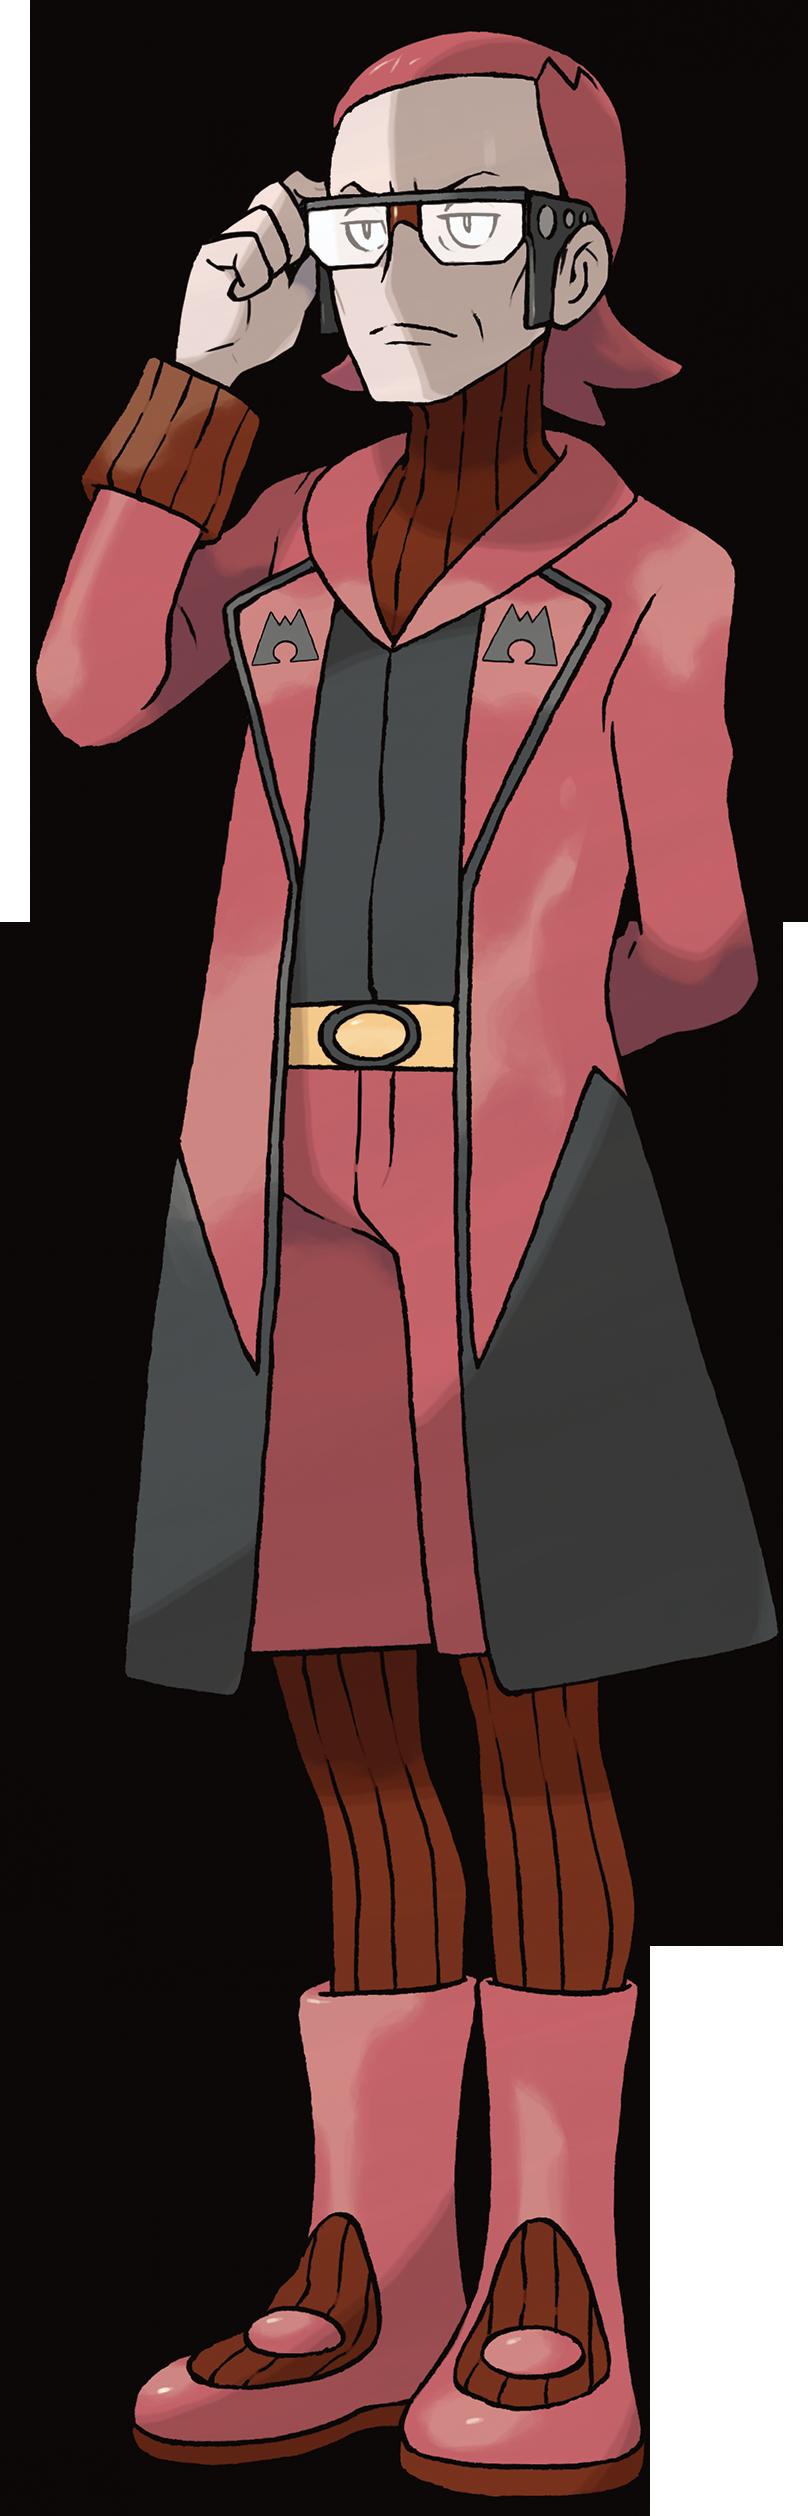 Marc, Boss von Team Magma